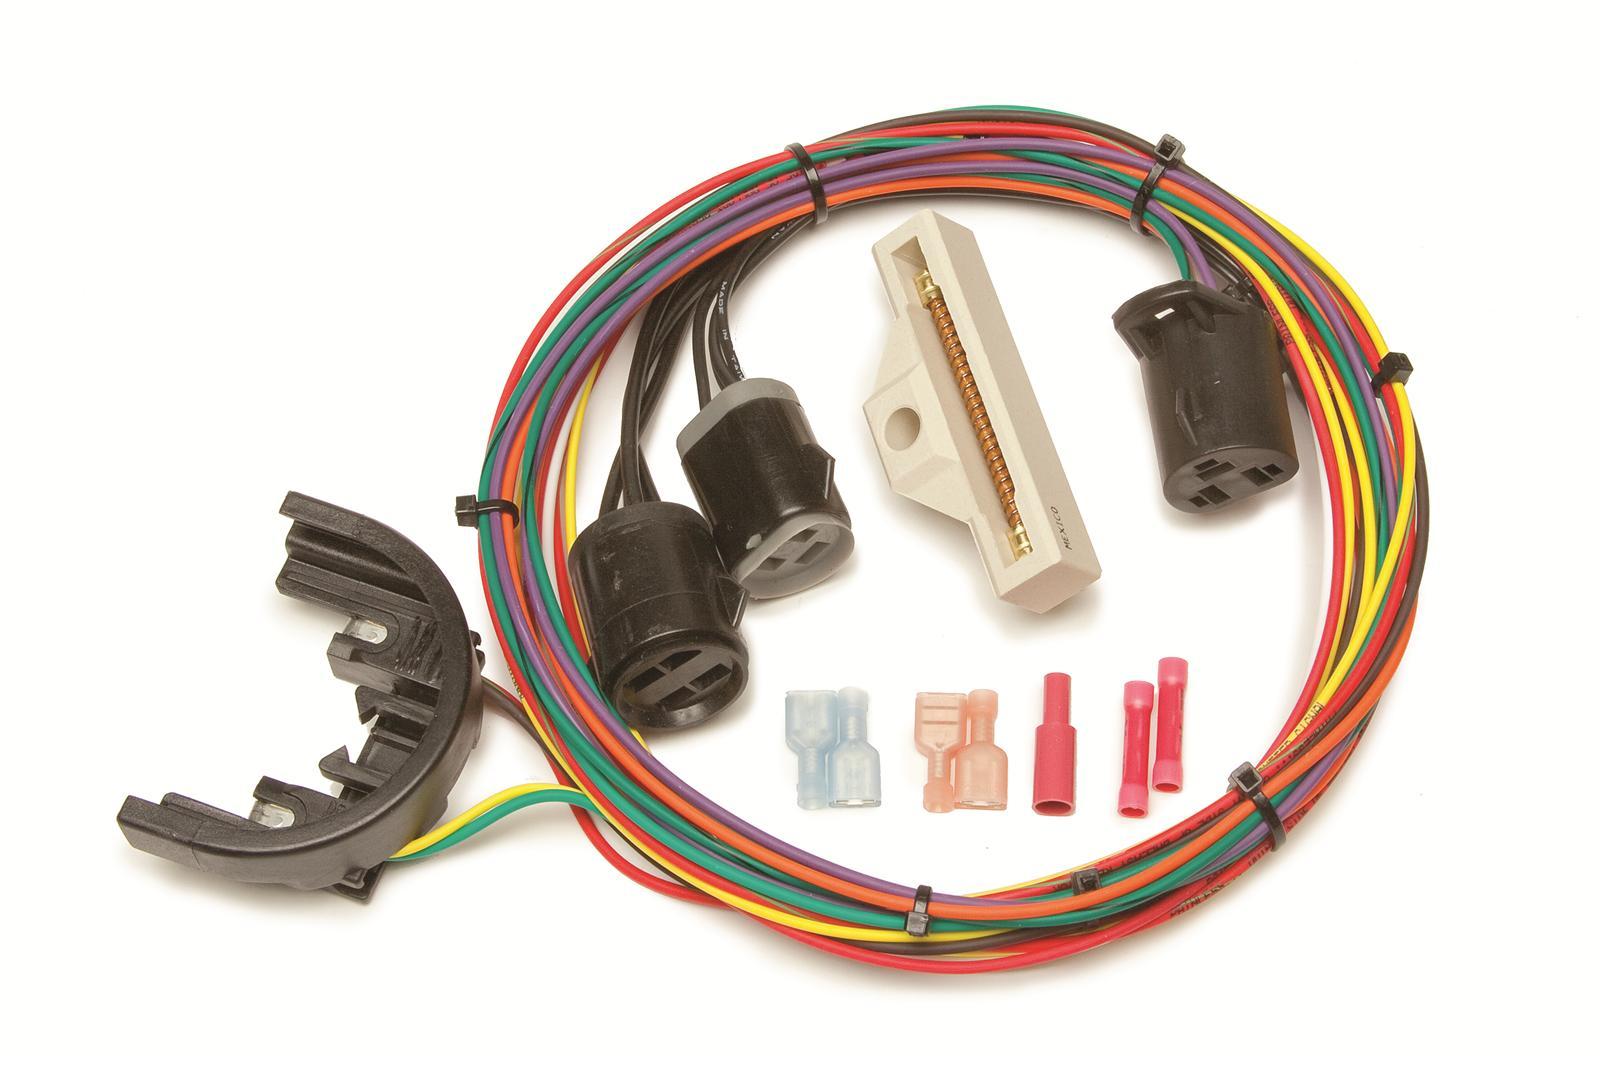 Cj7 Painless Wiring Harness